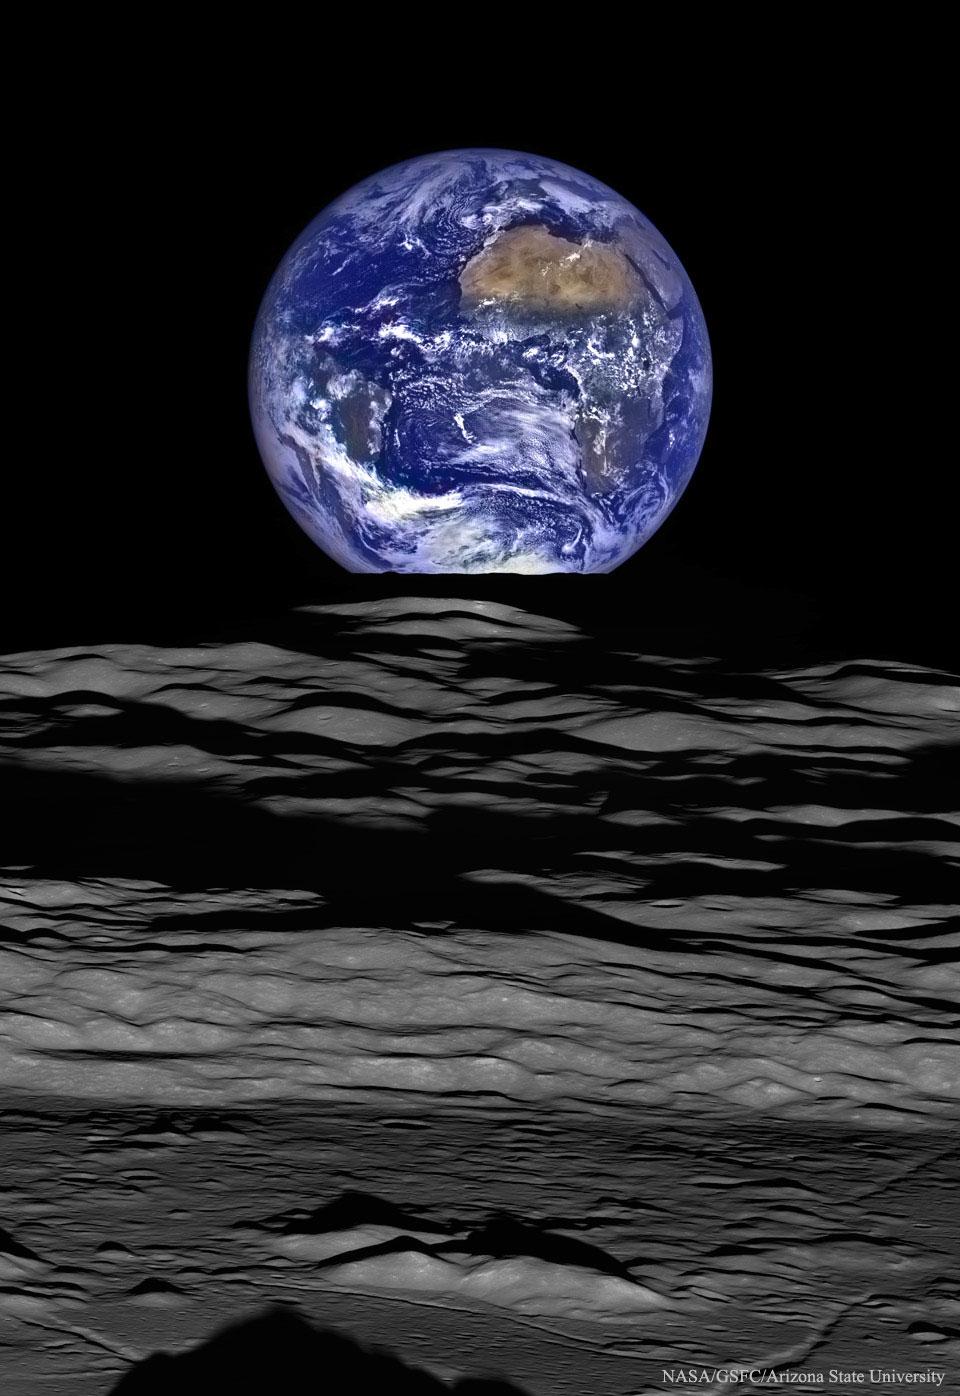 http://apod.nasa.gov/apod/image/1601/Earthrise_LRO_5634.jpg